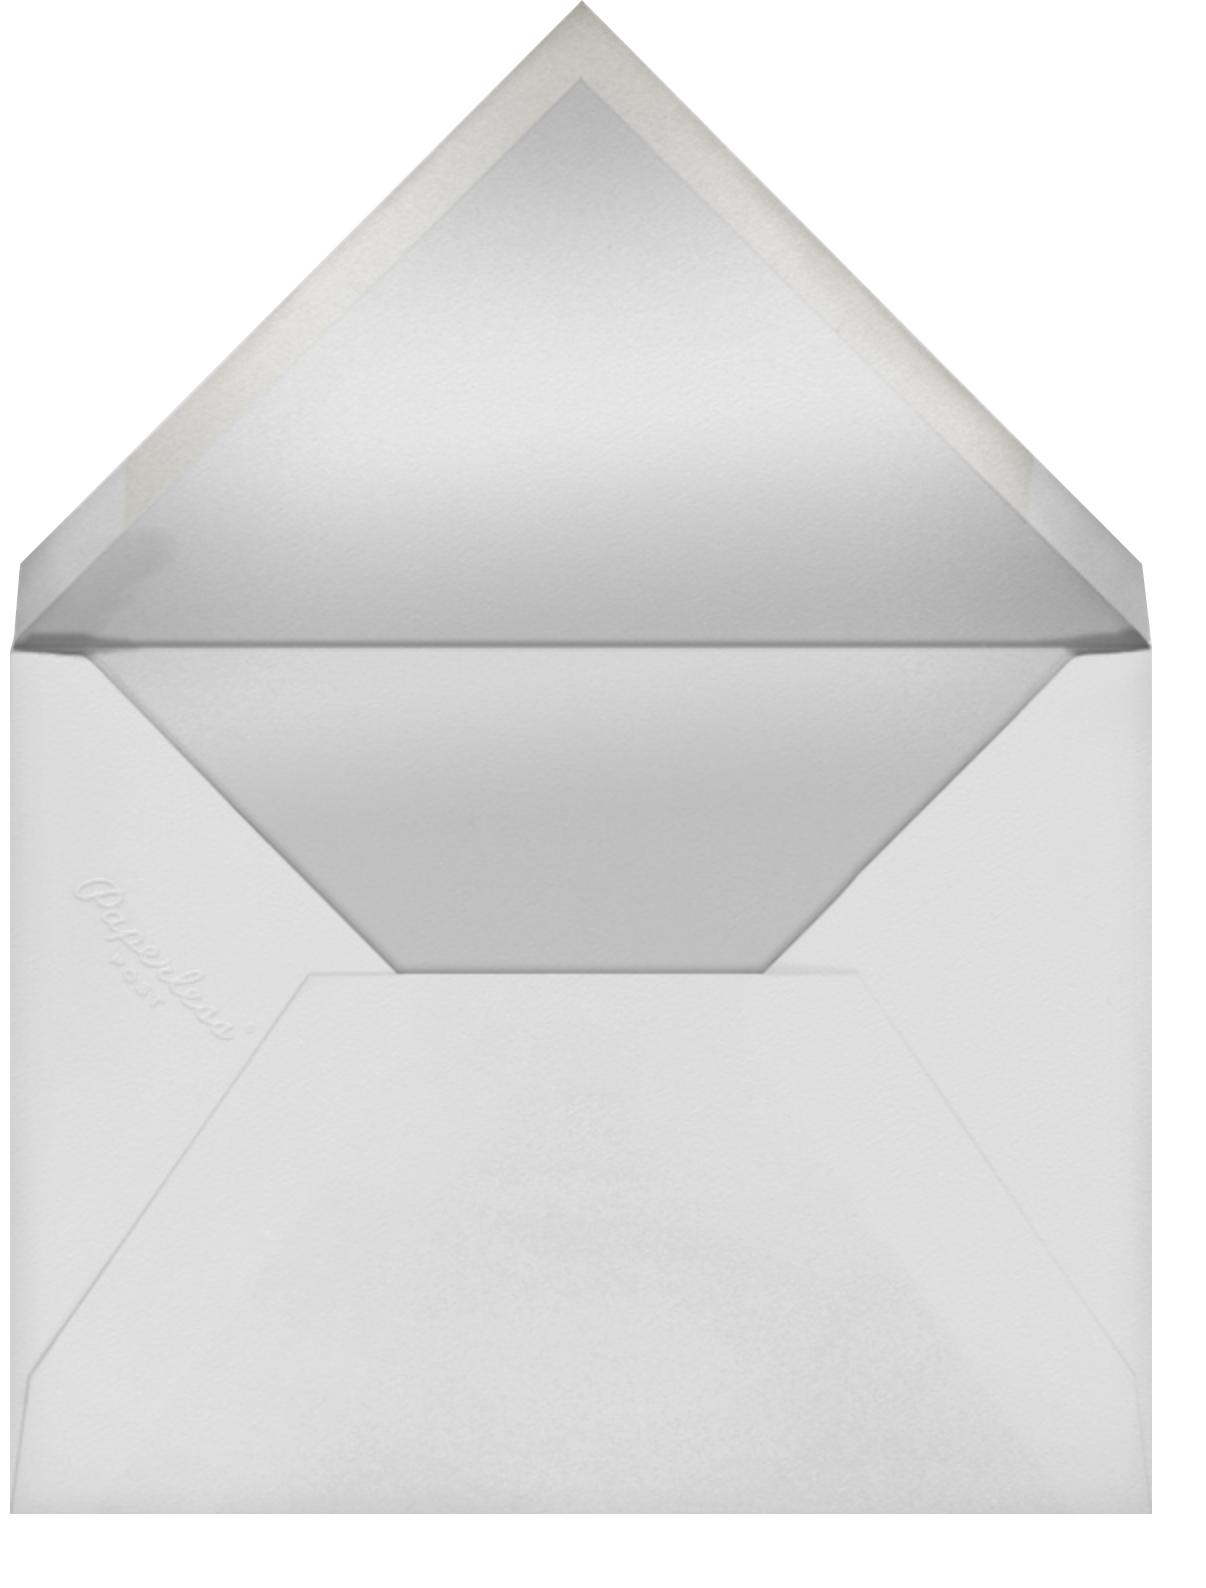 Knotwork White Square - Paperless Post - General entertaining - envelope back